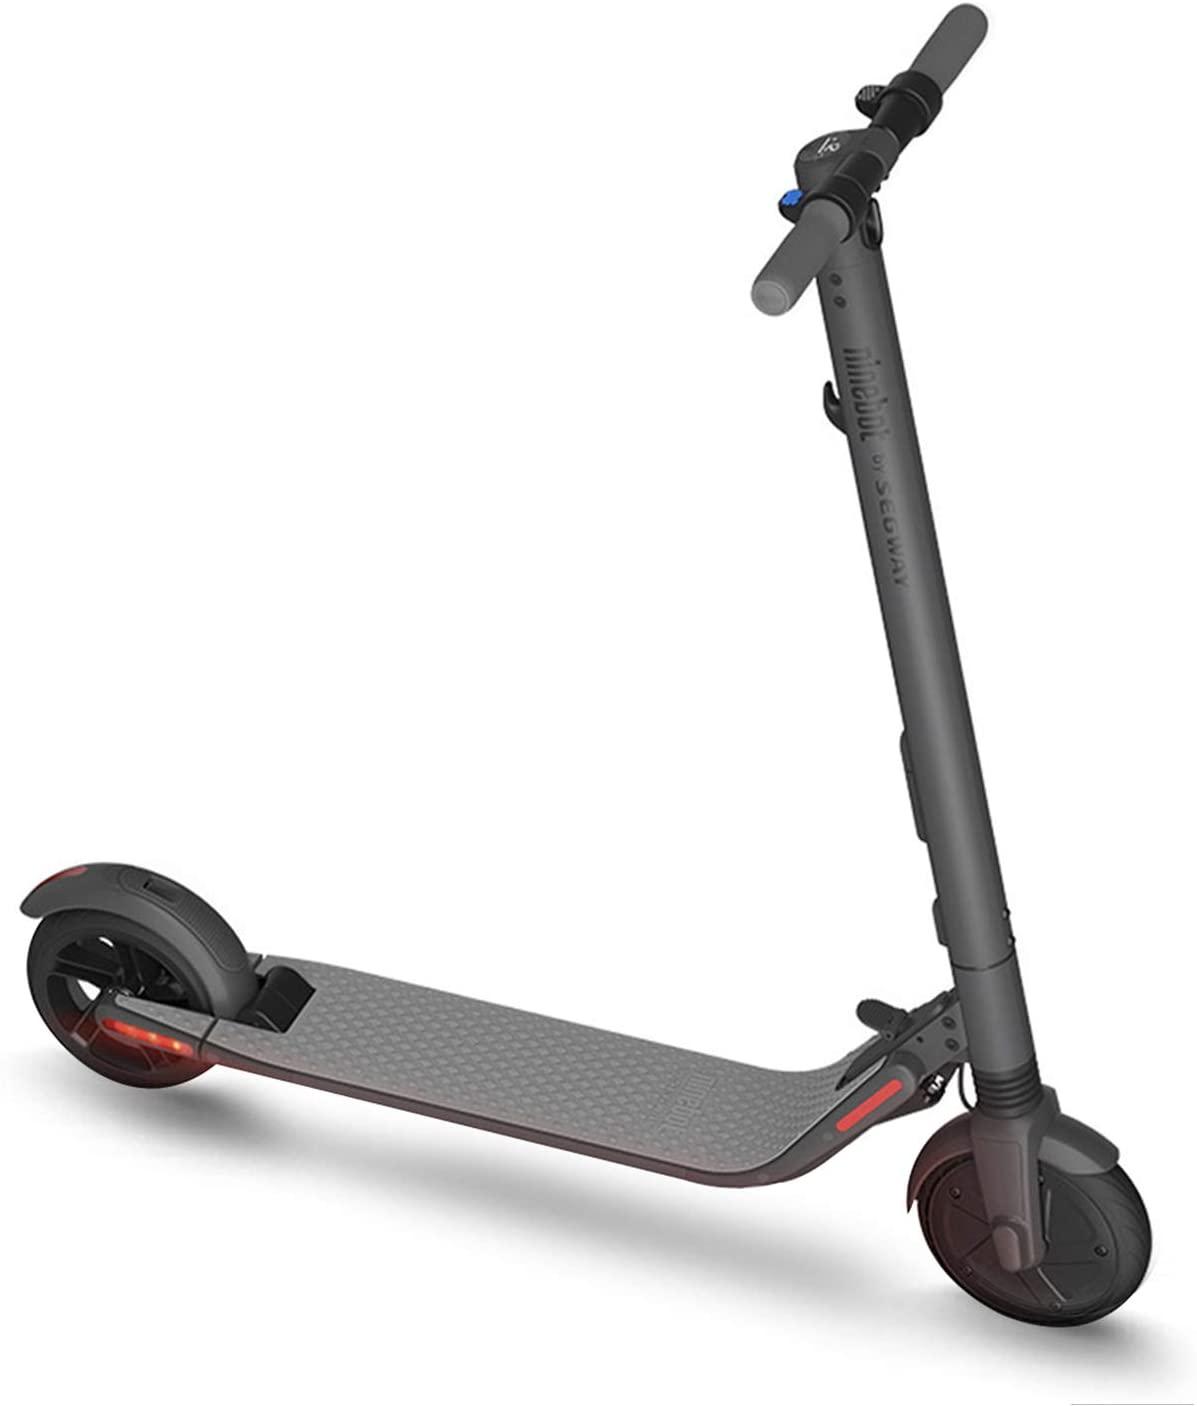 Segway Ninebot ES2 Electric Kick Scooter